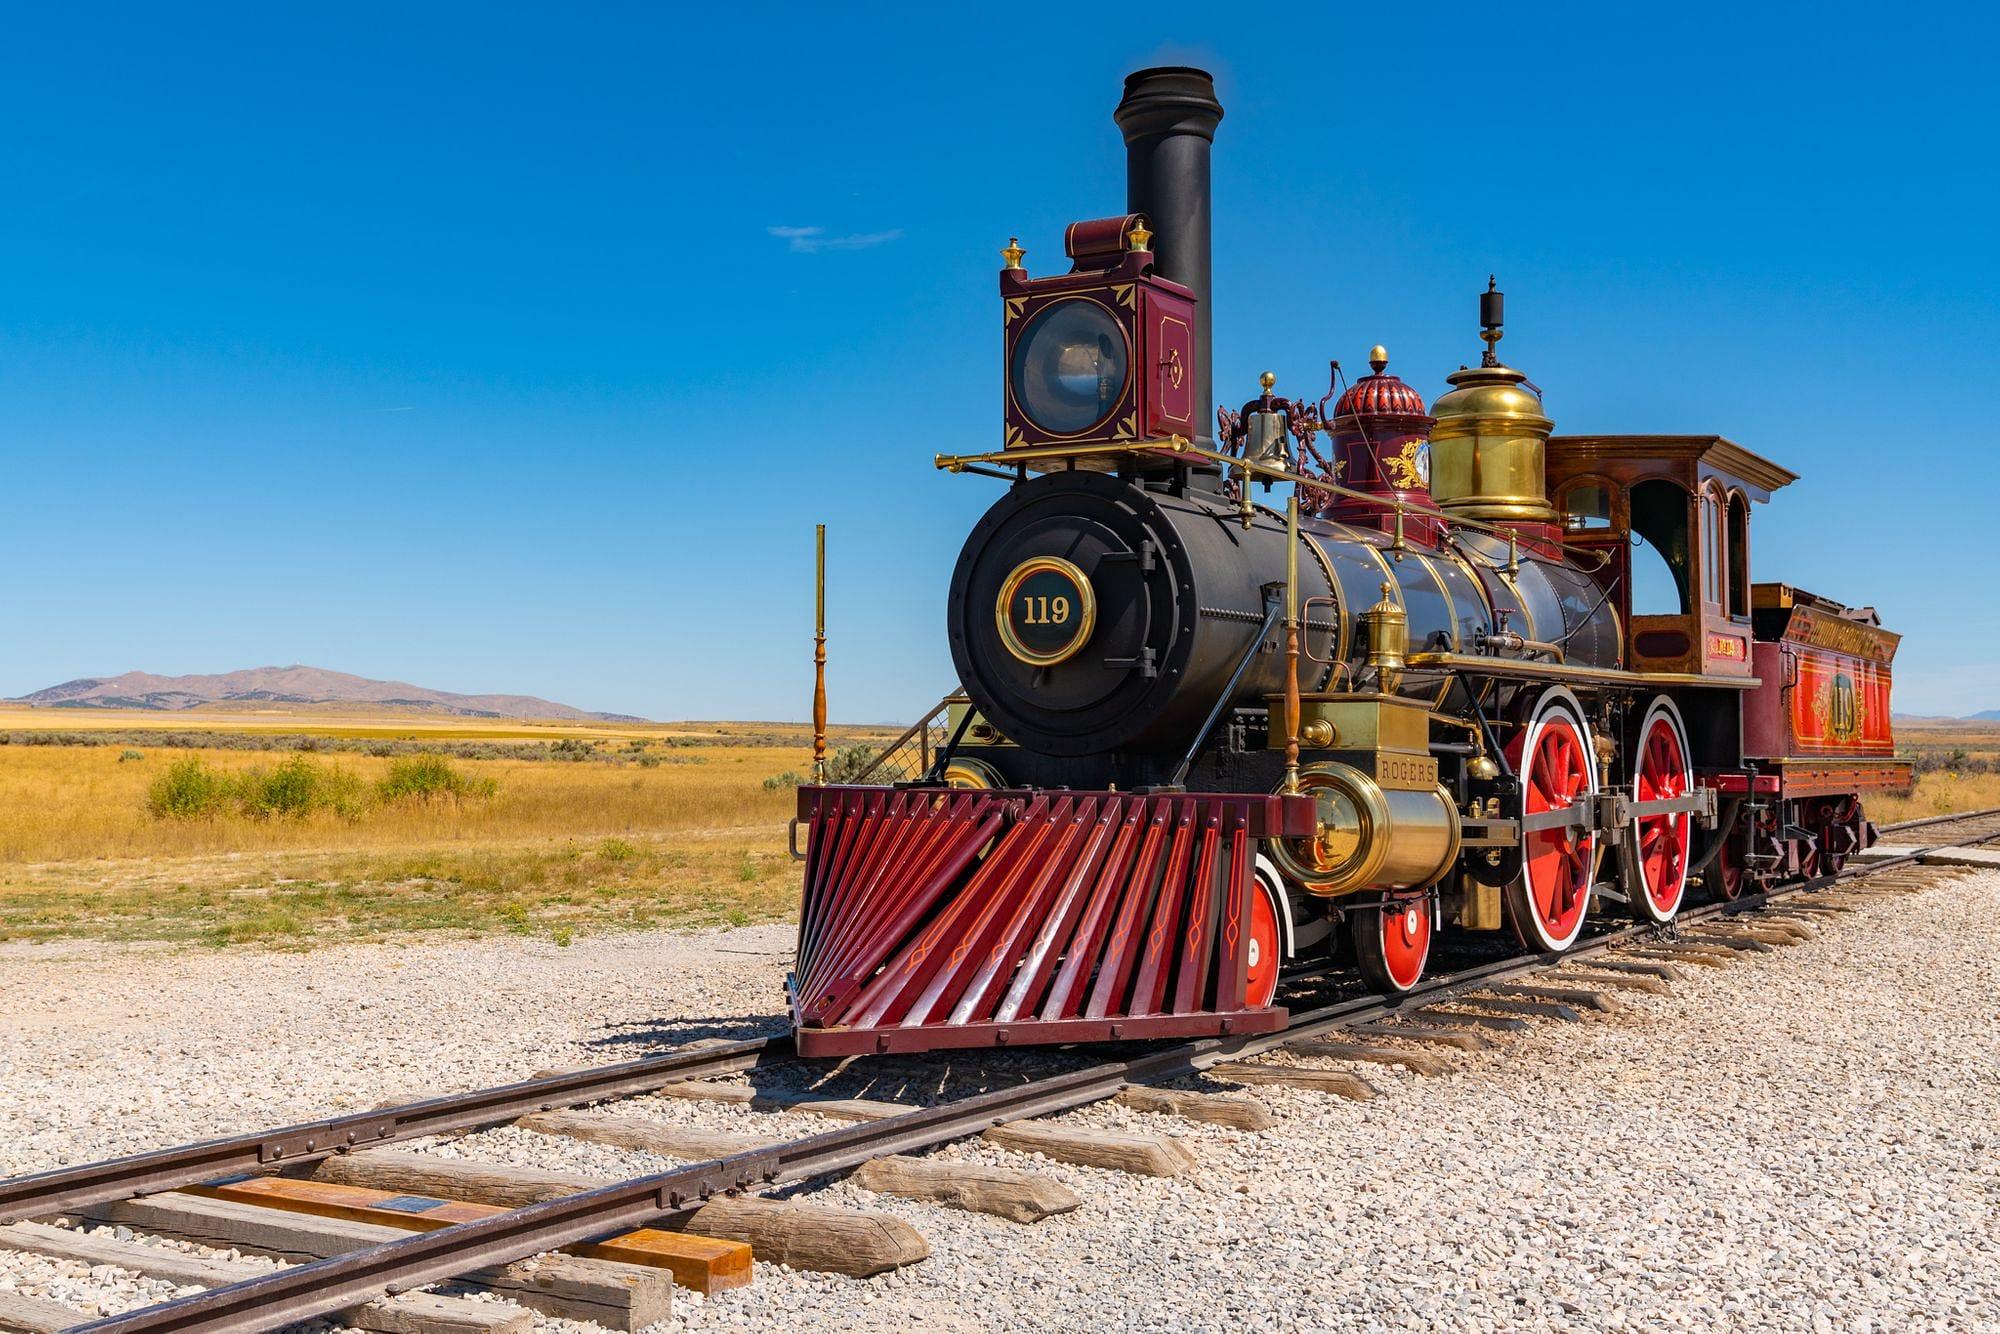 Union Pacific No 119 Locomotive